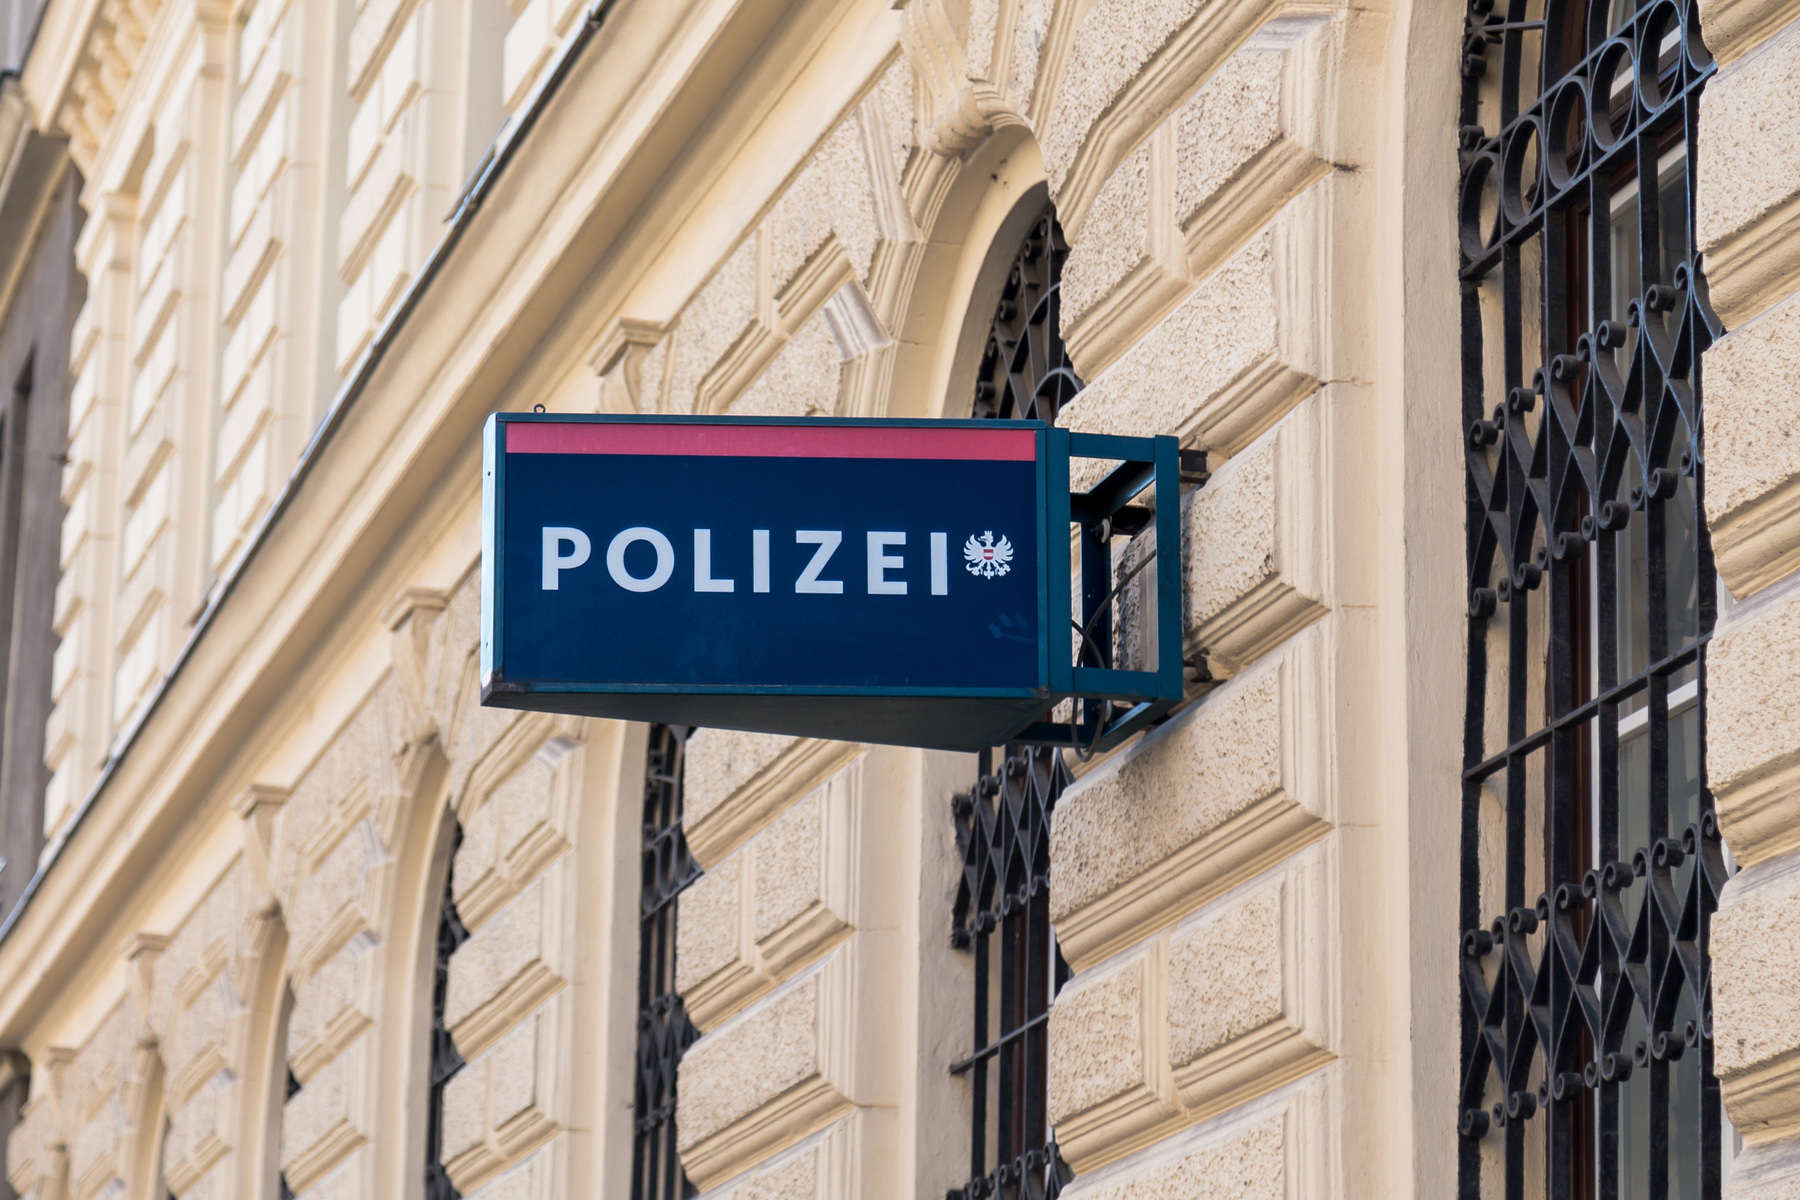 Polizei Austria